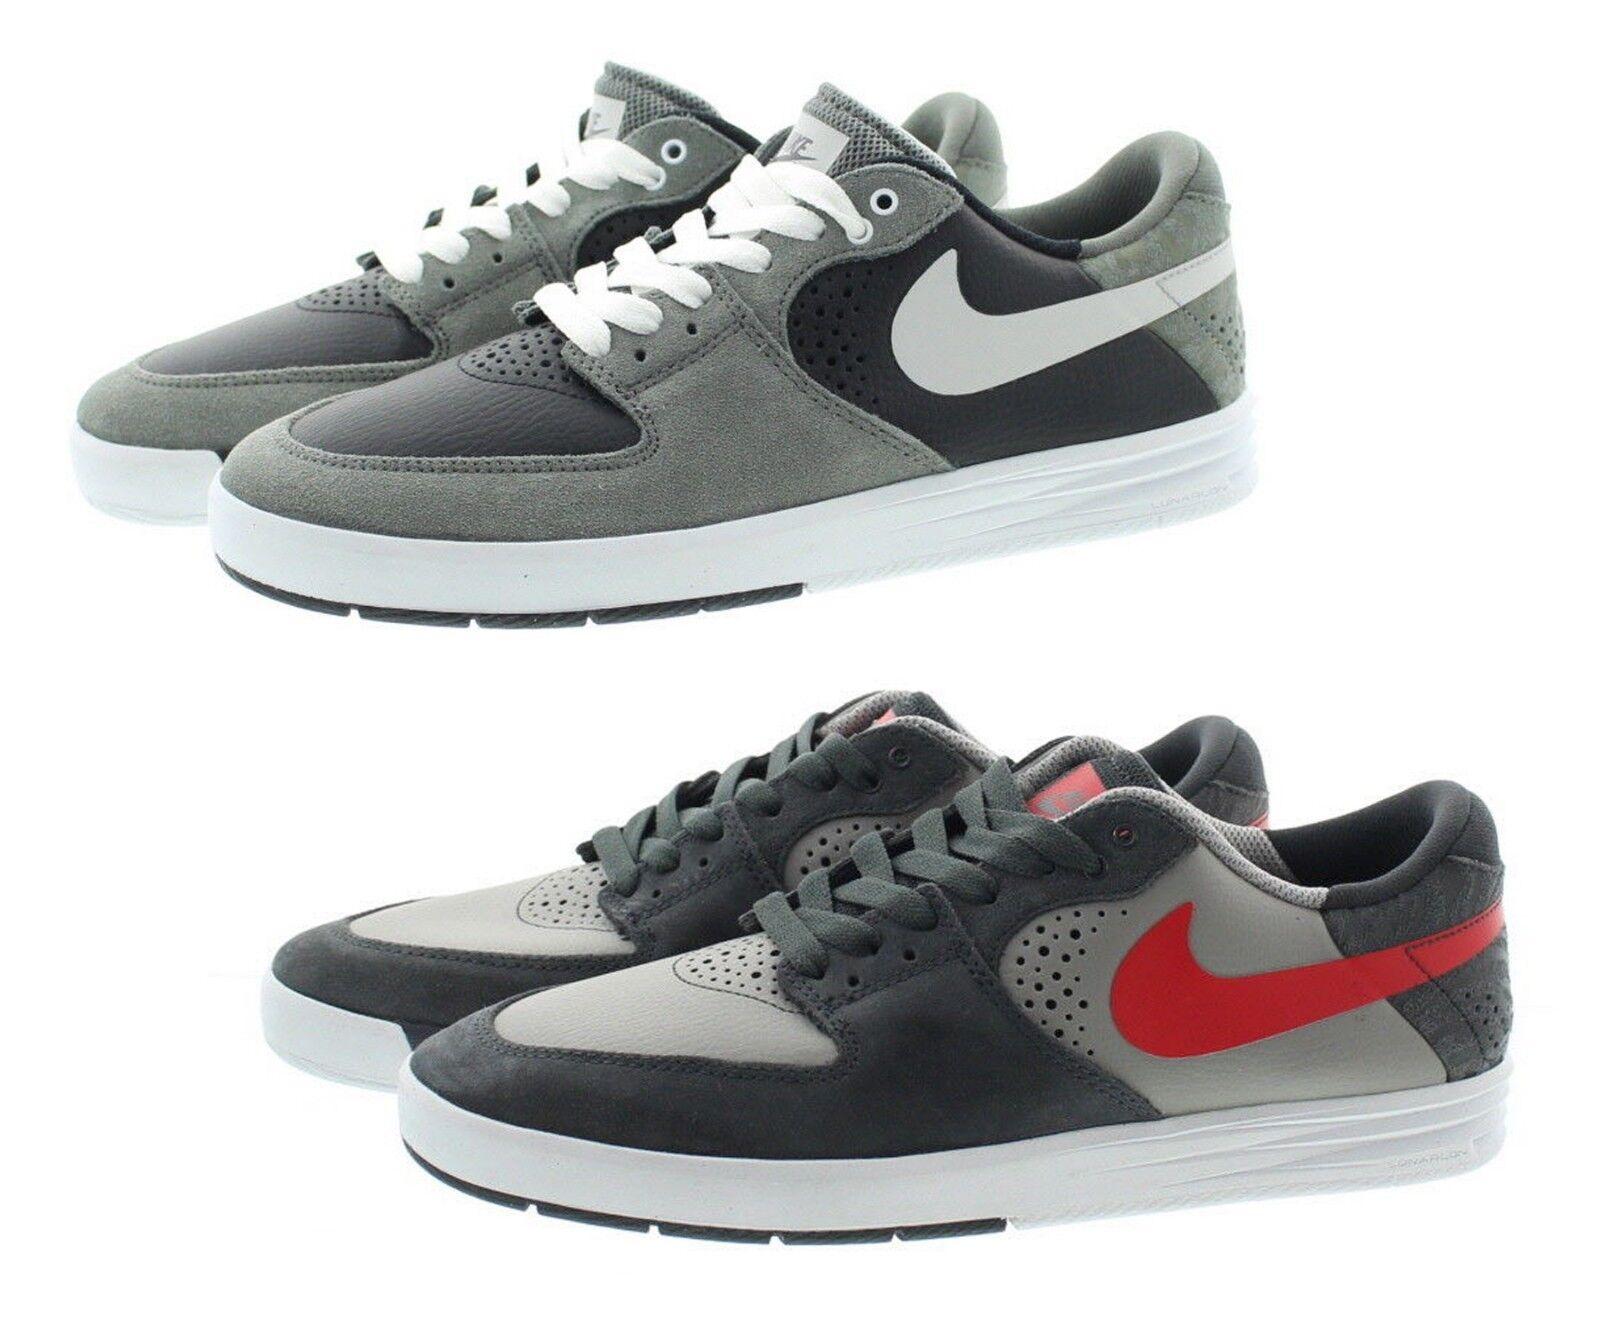 Nike 599662 Mens Skateboarding Paul Rodriguez Low Top Skateboarding Mens Shoes Sneakers 3193a9